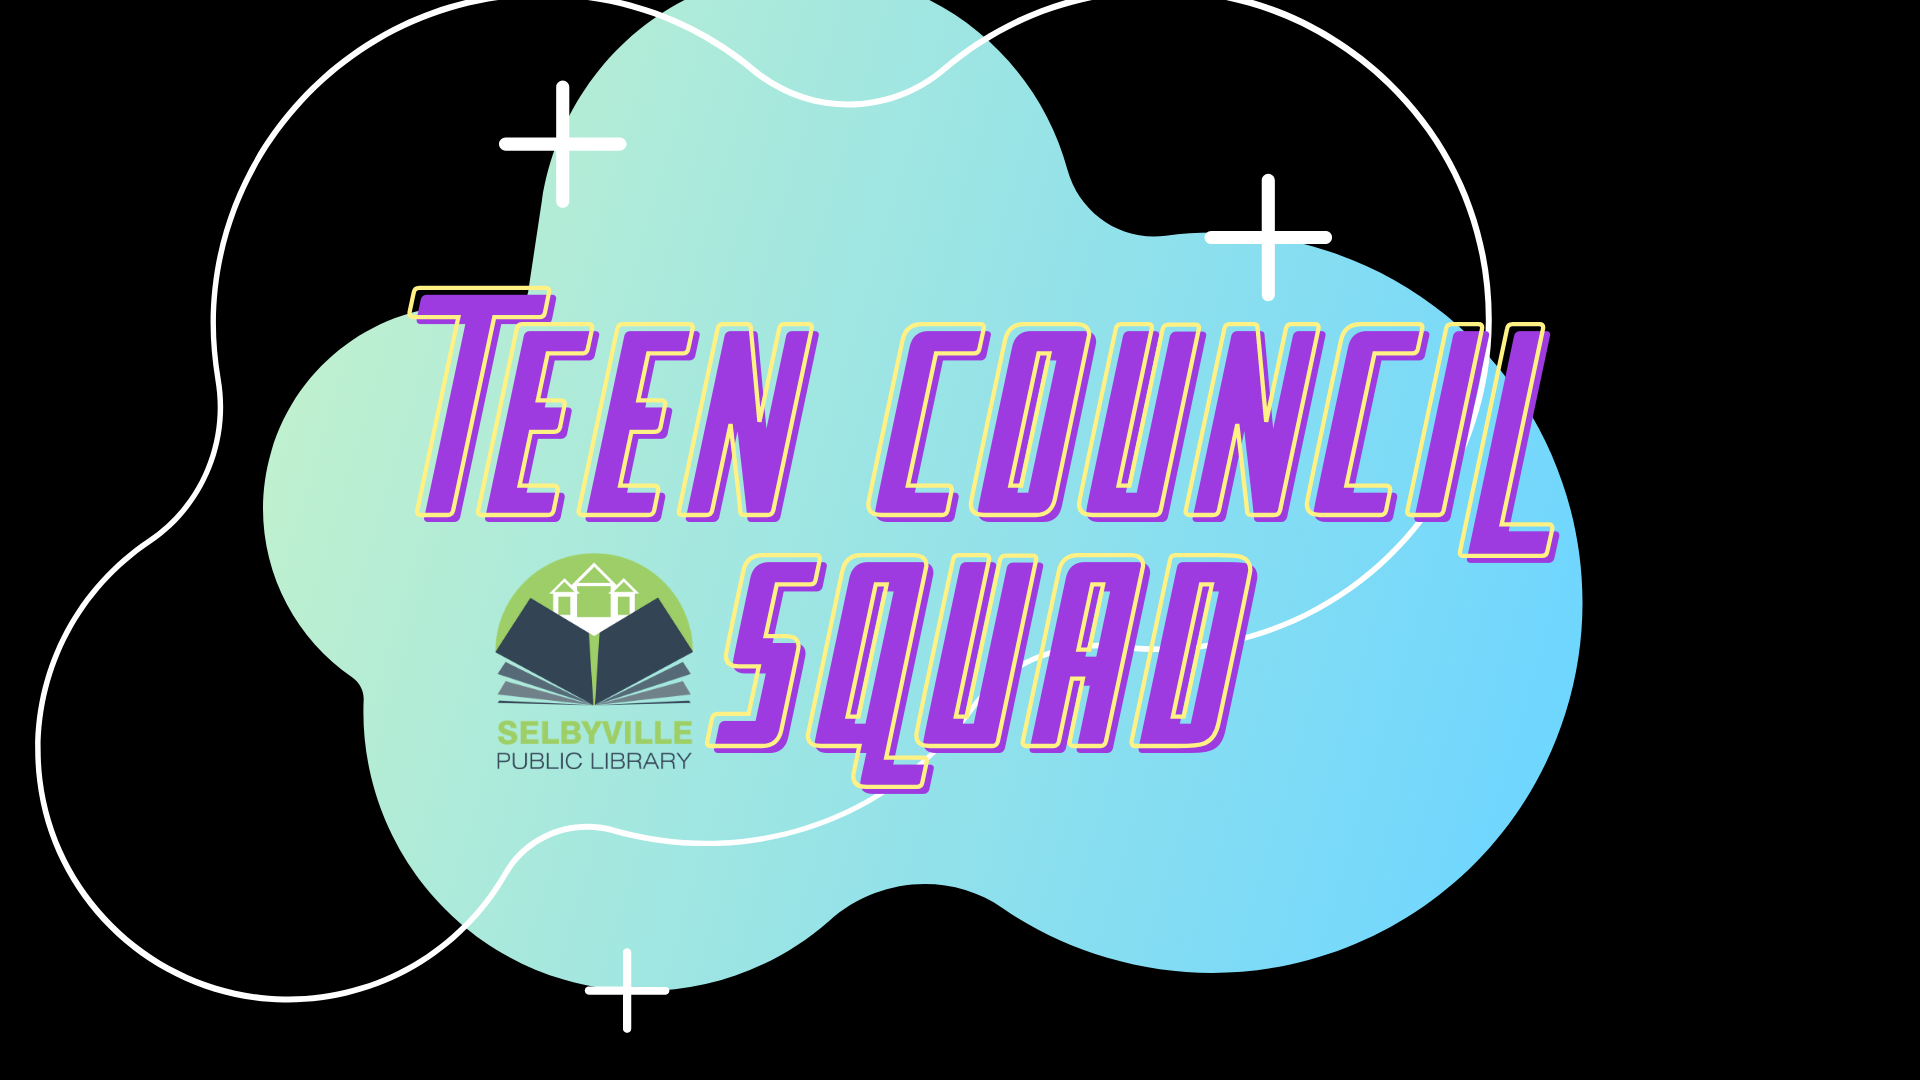 Teen Council Squad